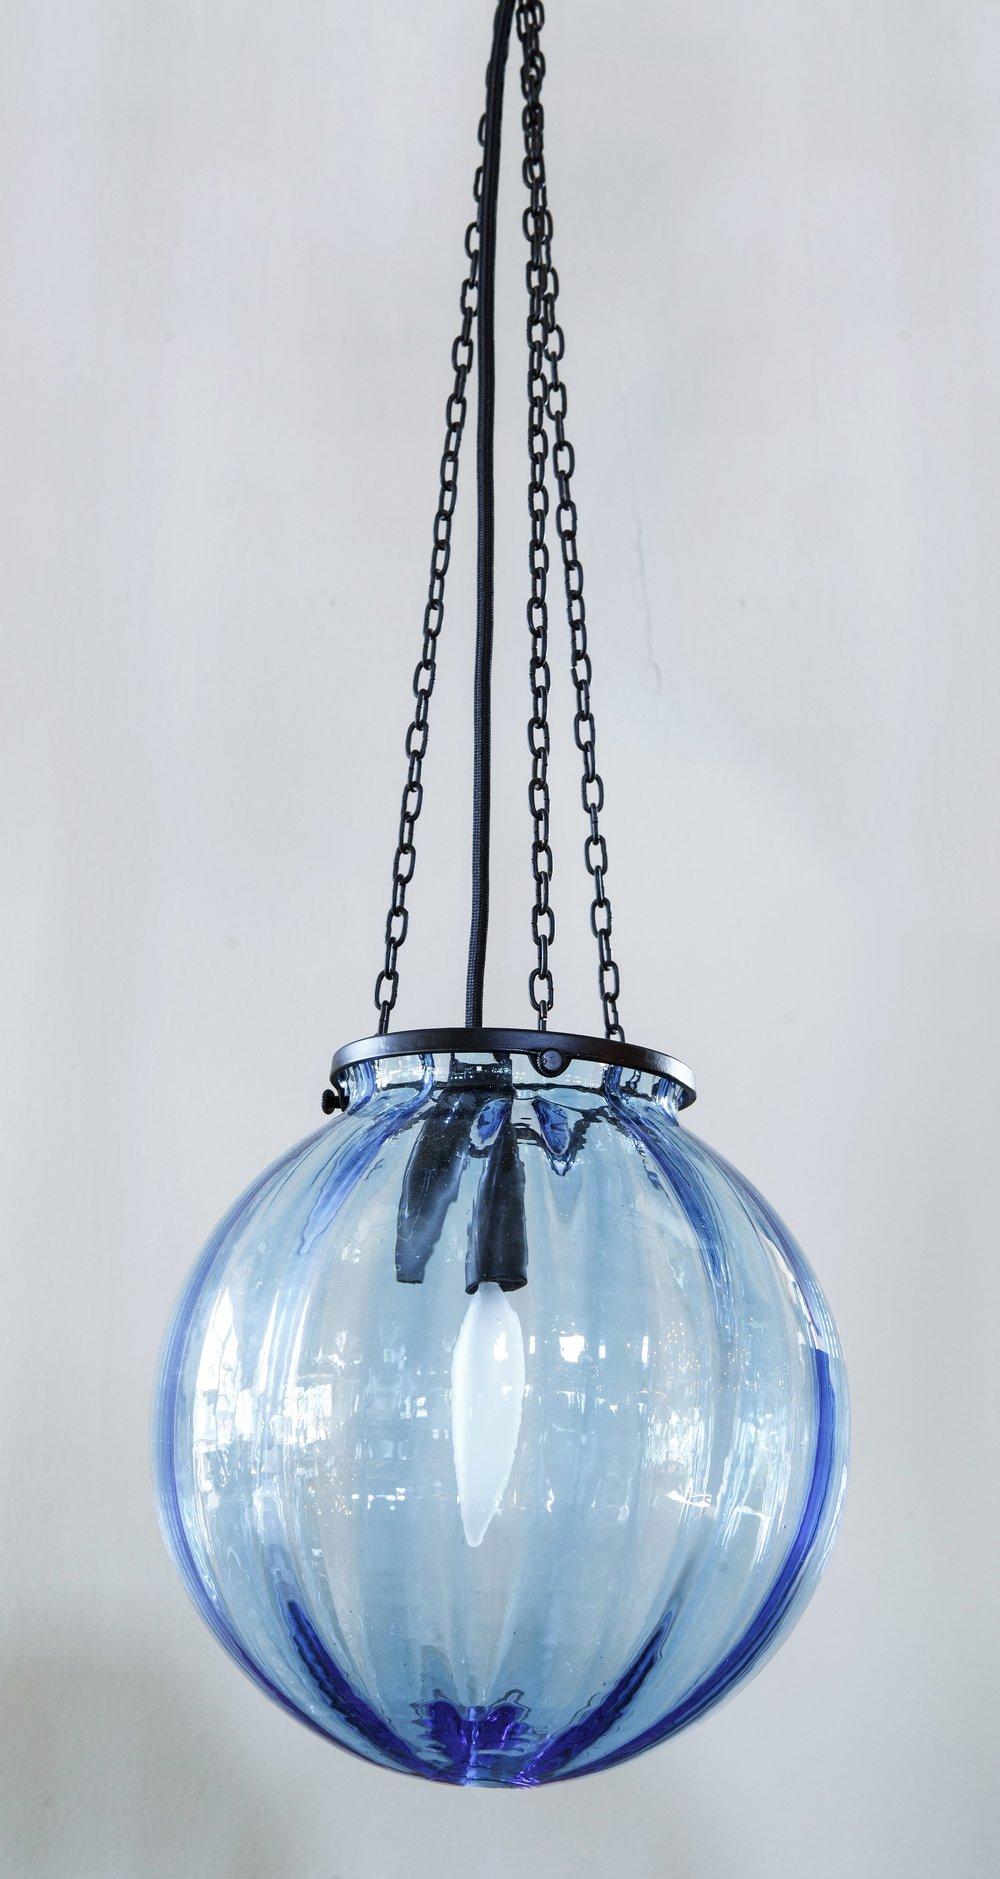 Vintage Hand-Blown Murano Glass Blue Sphere Light